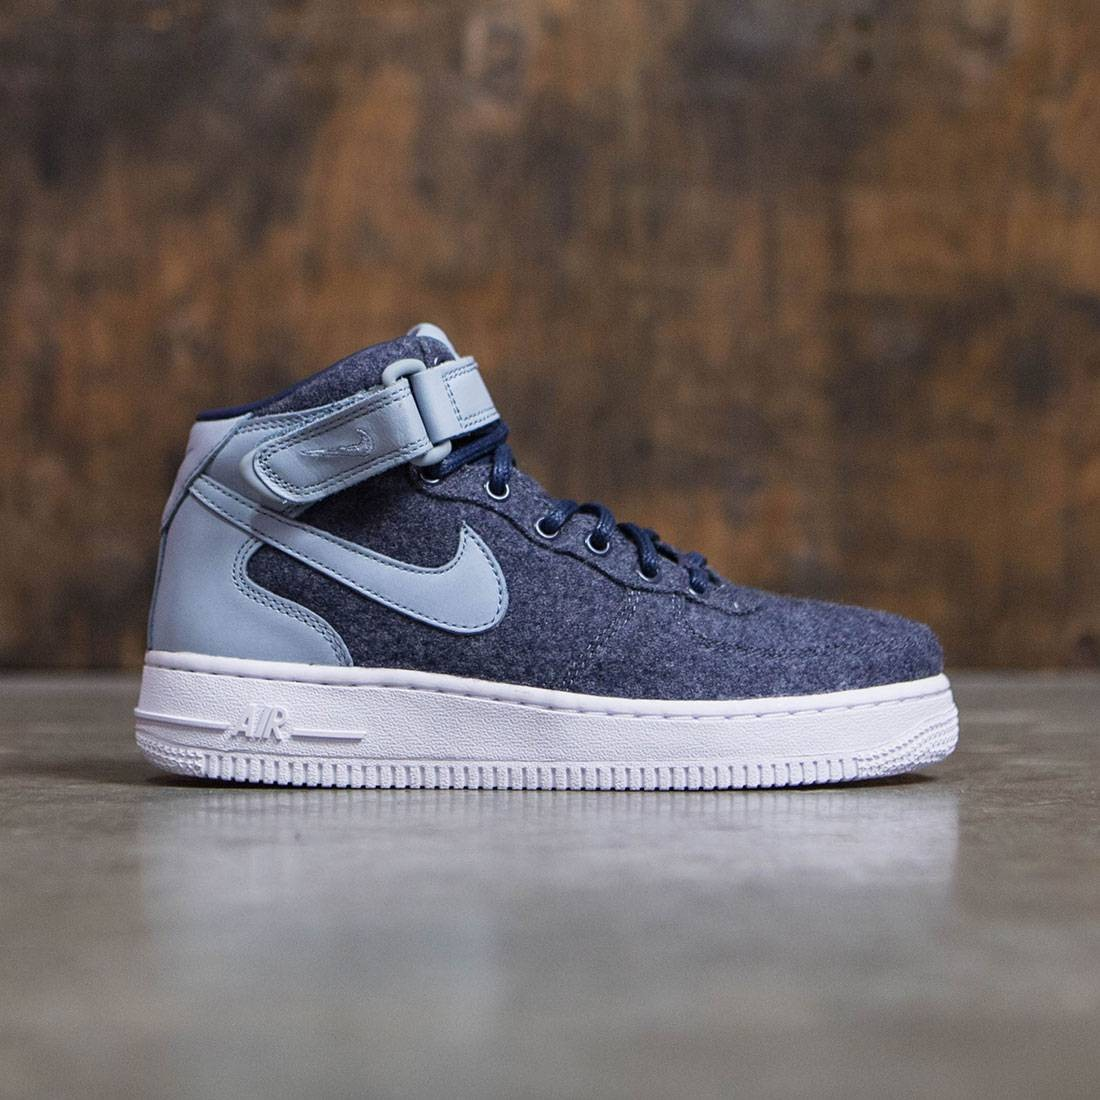 super popular 8c62b a3718 Nike Women W Air Force 1 '07 Mid Lthr Prm (midnight navy / midnight  navy-blue grey)